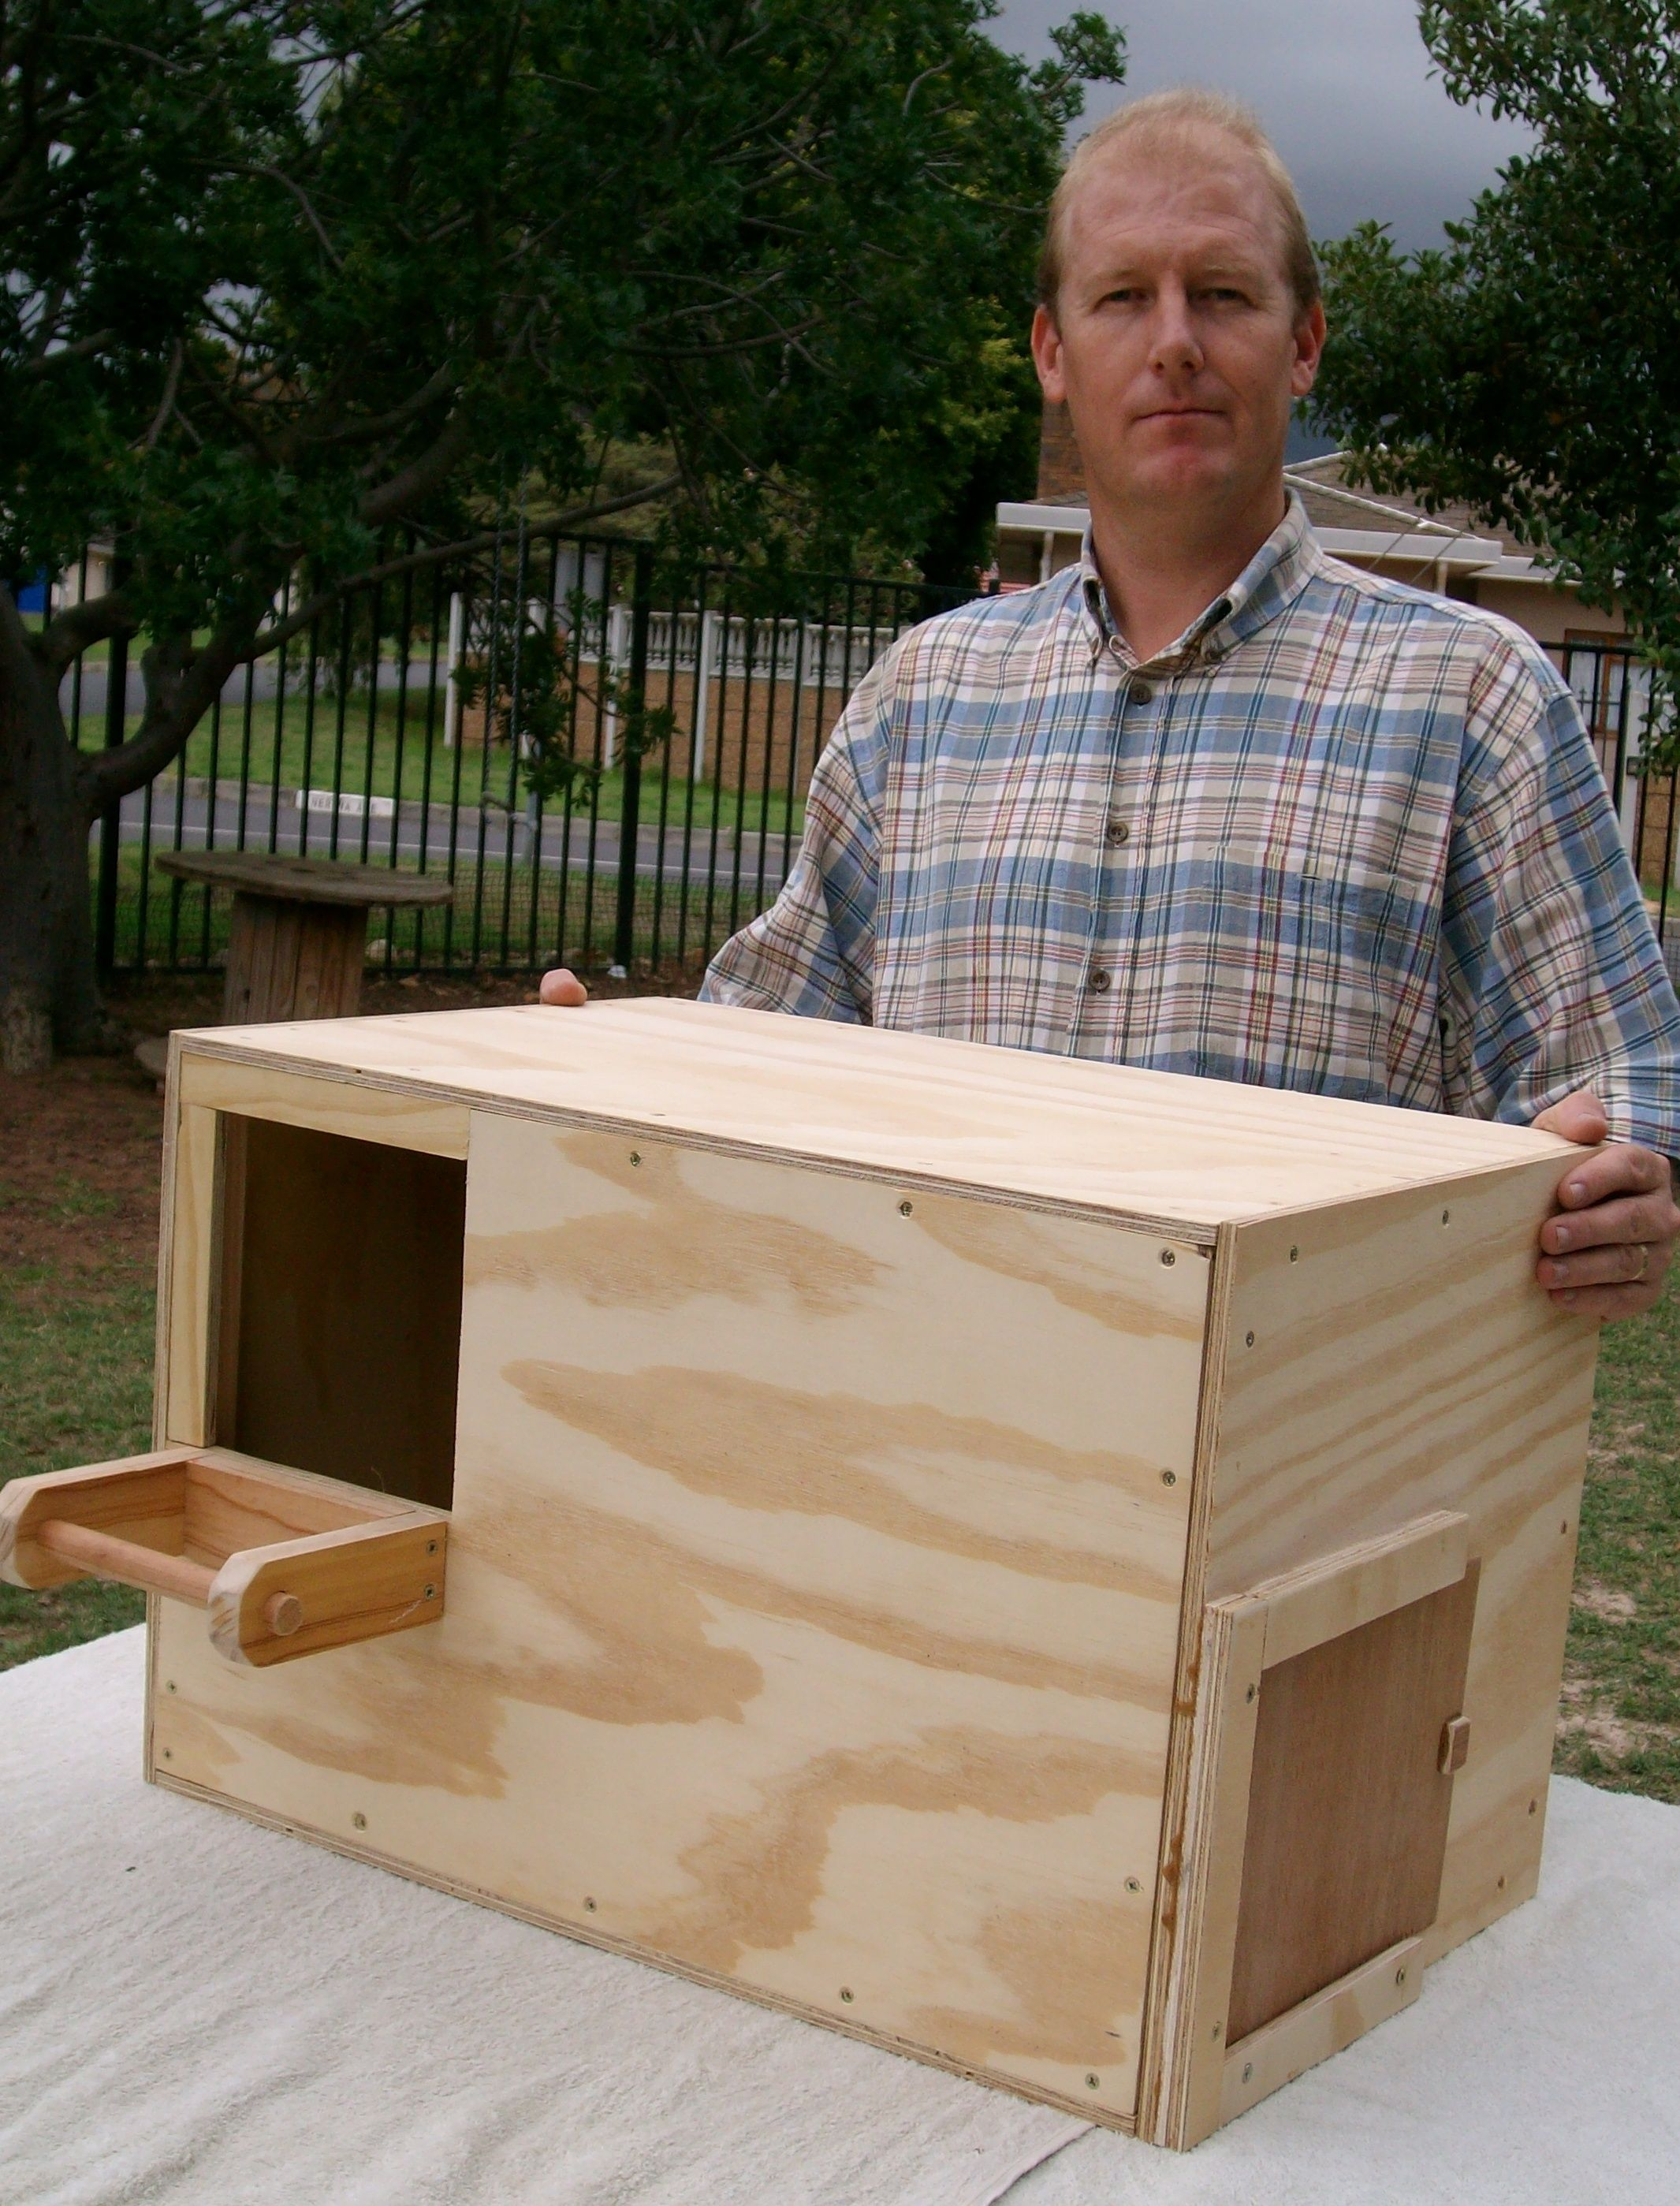 die besten 25 insektenhotel bausatz ideen auf pinterest schwangerschaftsmuster tierh user. Black Bedroom Furniture Sets. Home Design Ideas